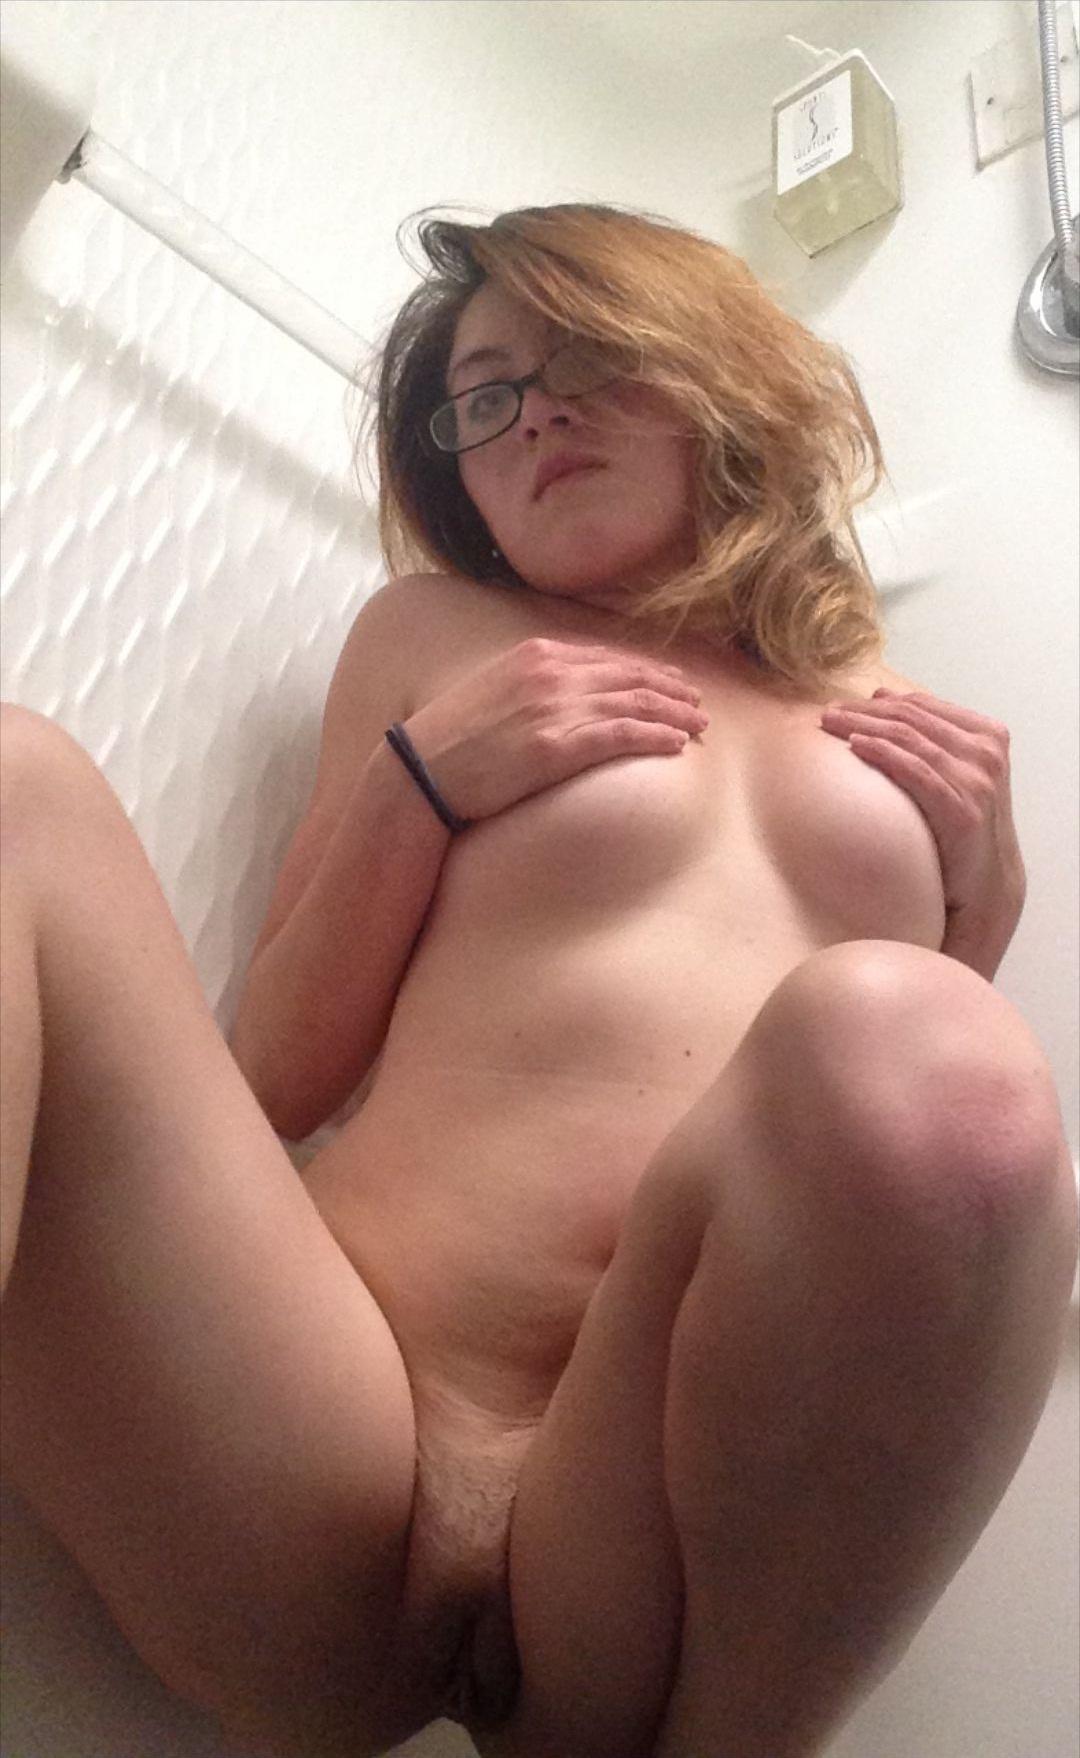 http://www.sextingpics.com/wp-content/uploads/2017/05/media_HsWxjg_78d926b57c6ad2911589615d0bcae080.jpg